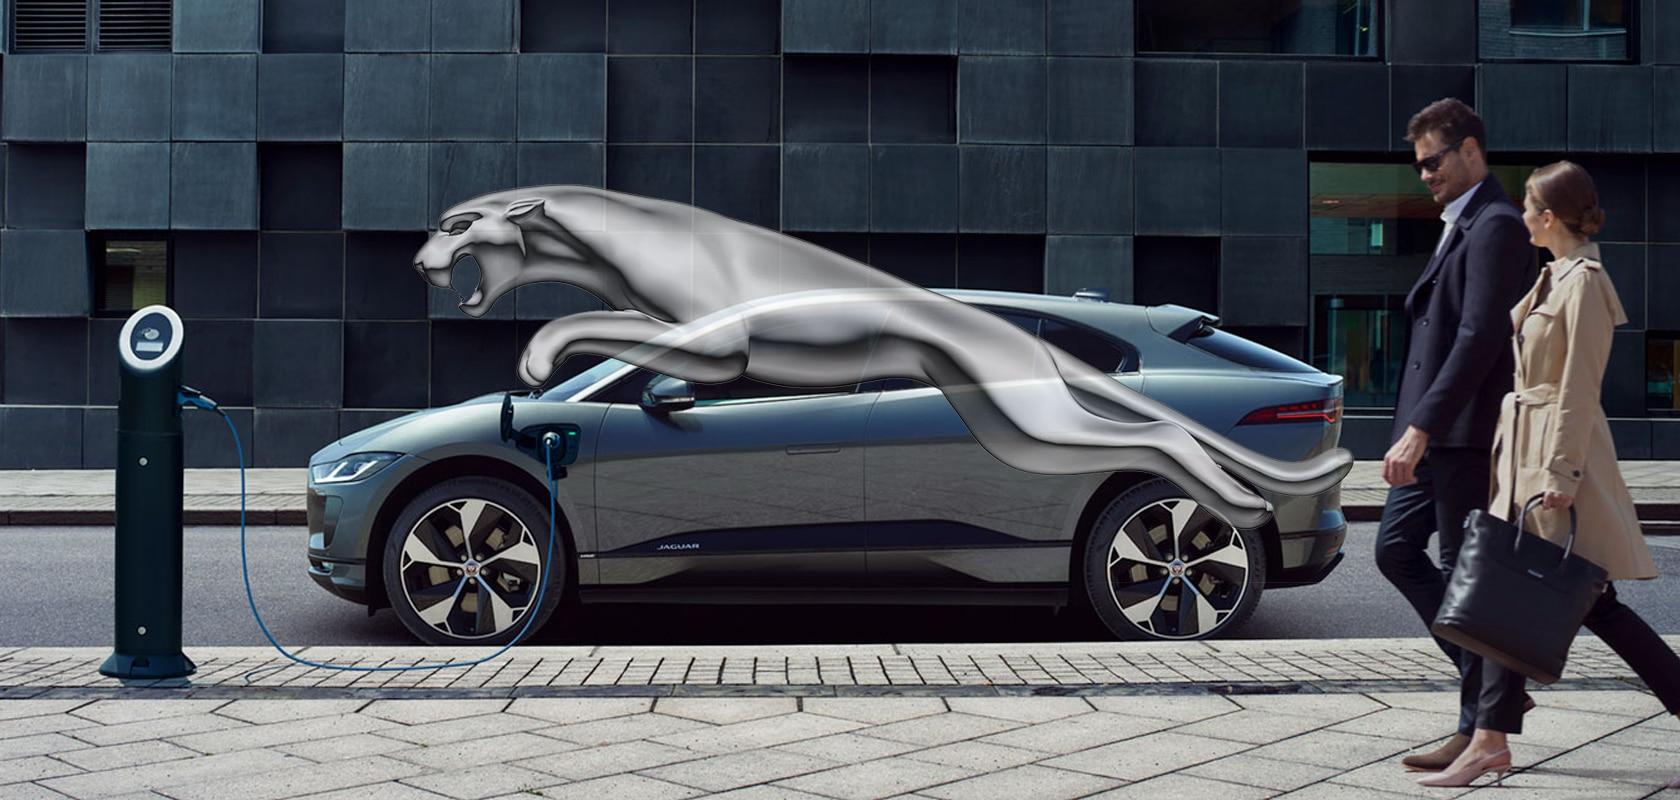 Marque Jaguar